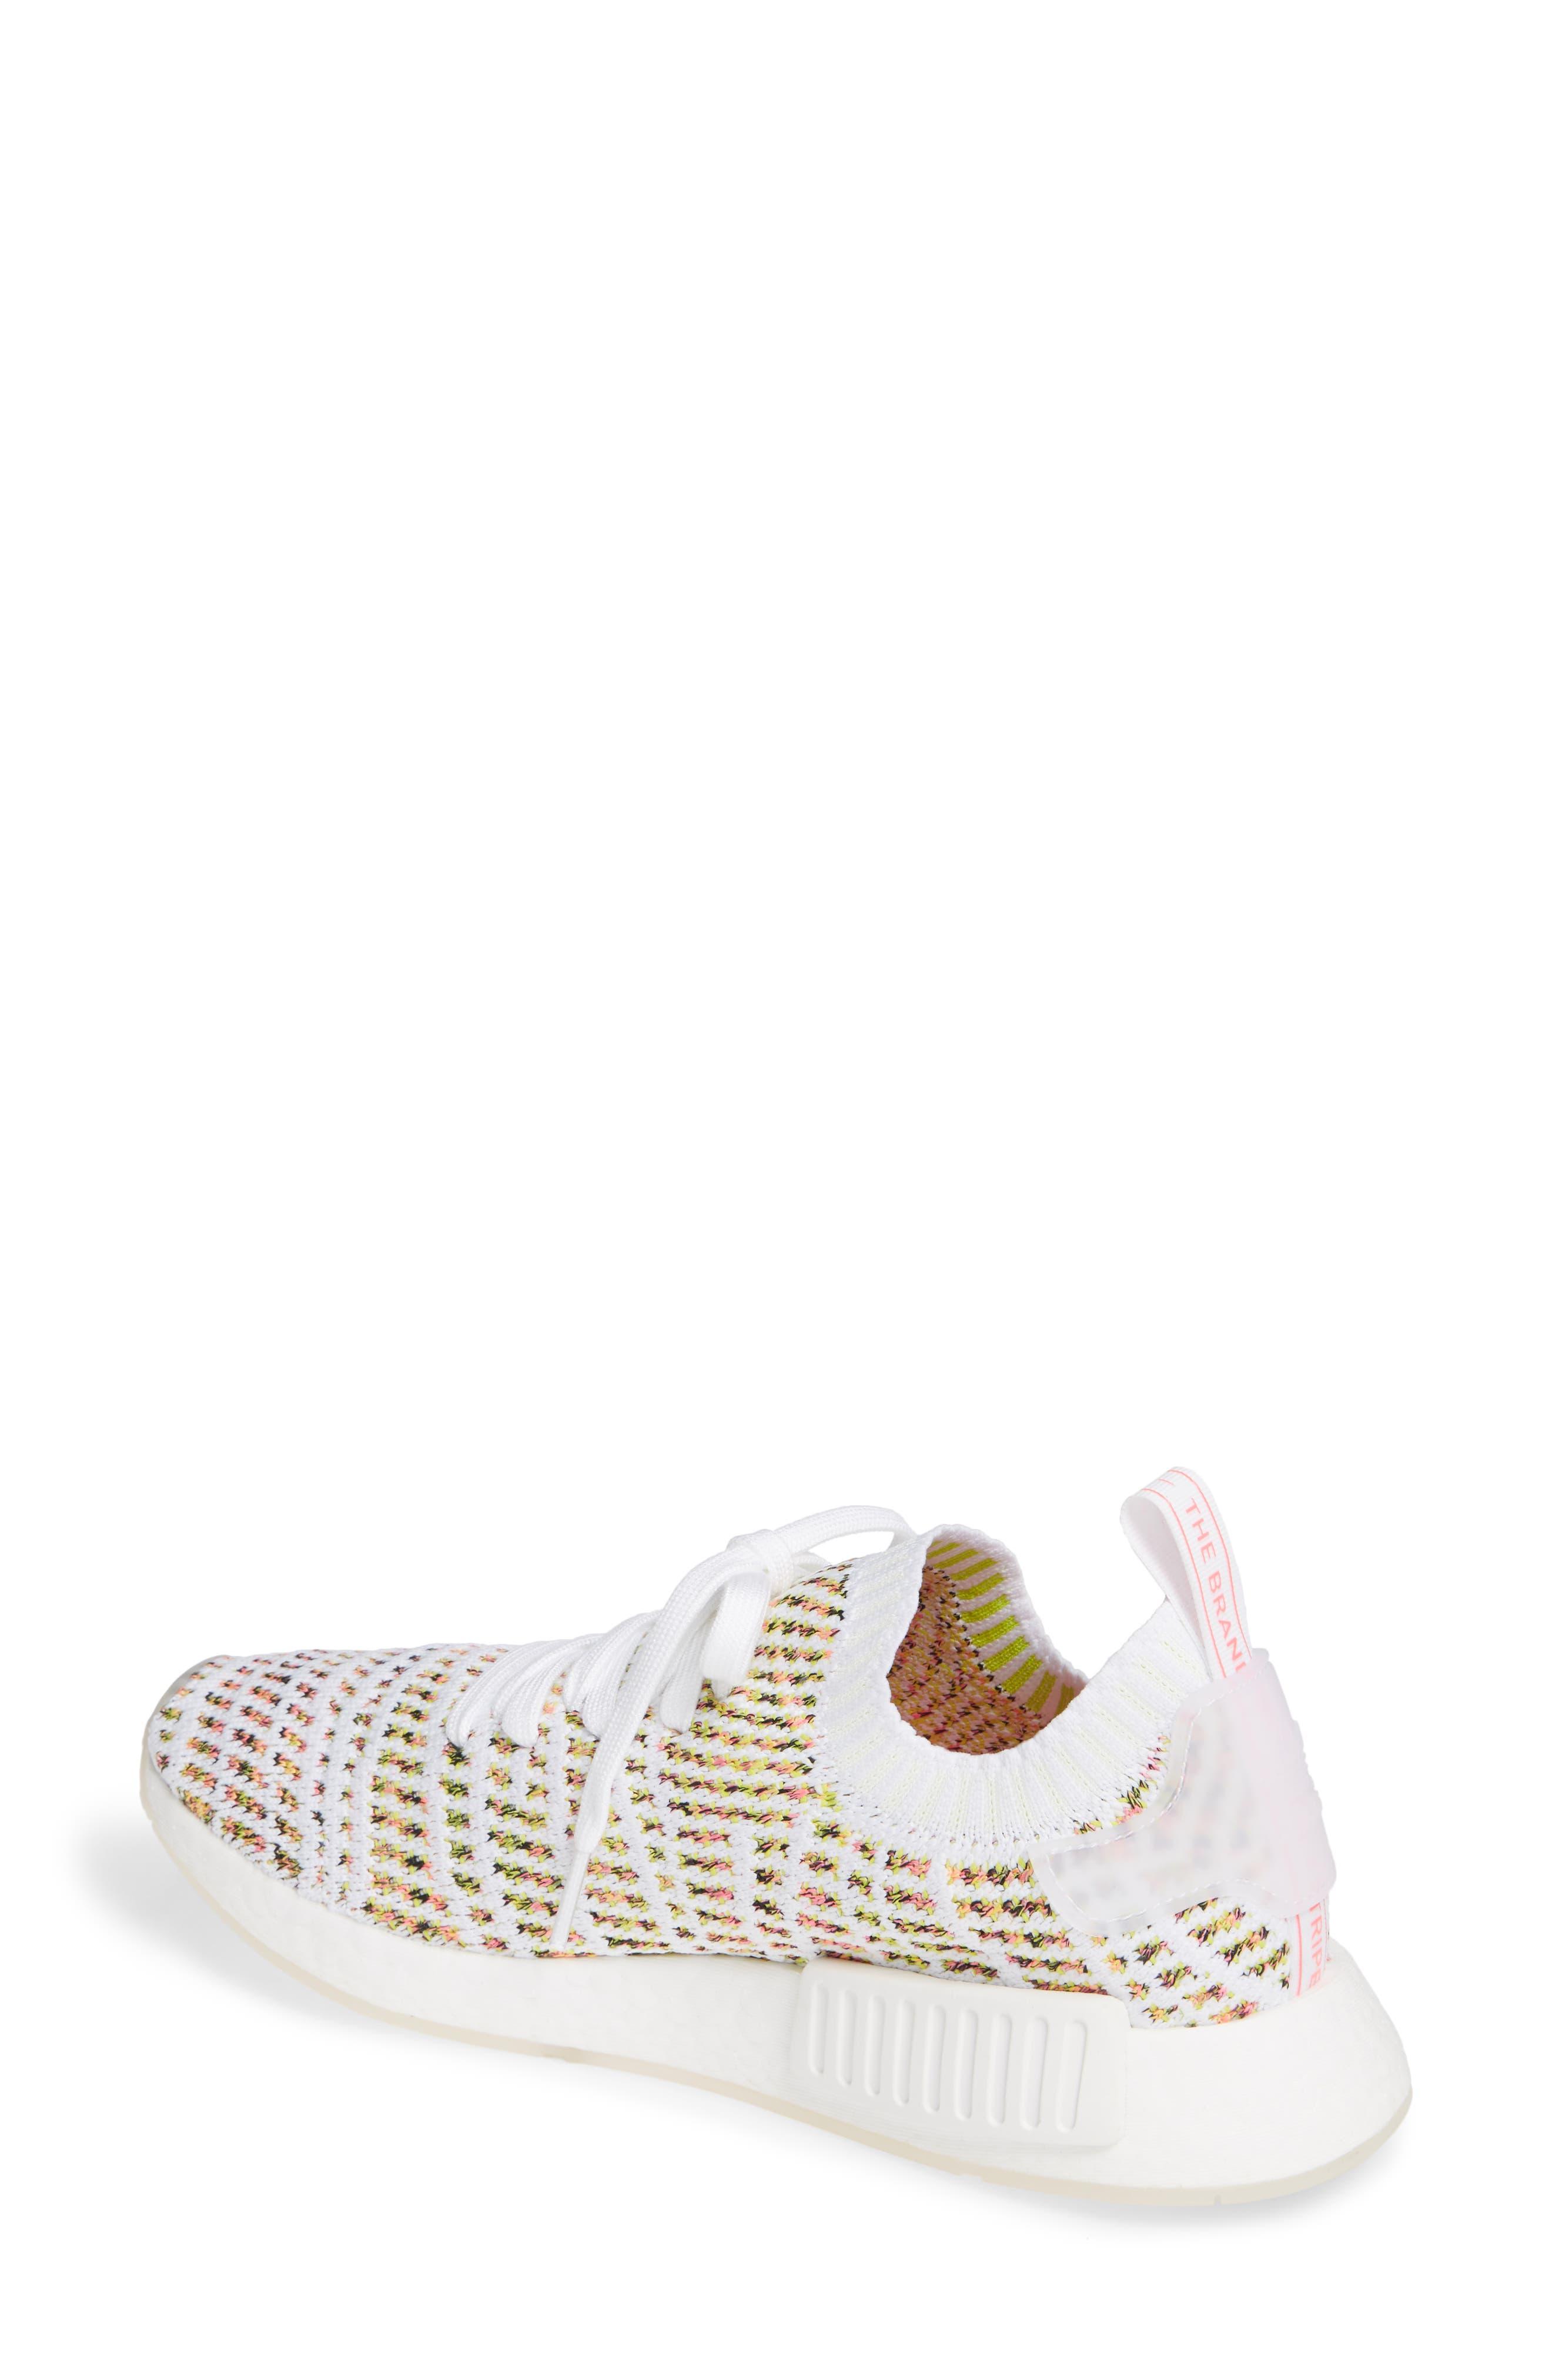 NMD R1 STLT Primeknit Sneaker,                             Alternate thumbnail 2, color,                             WHITE/ YELLOW/ SOLAR PINK